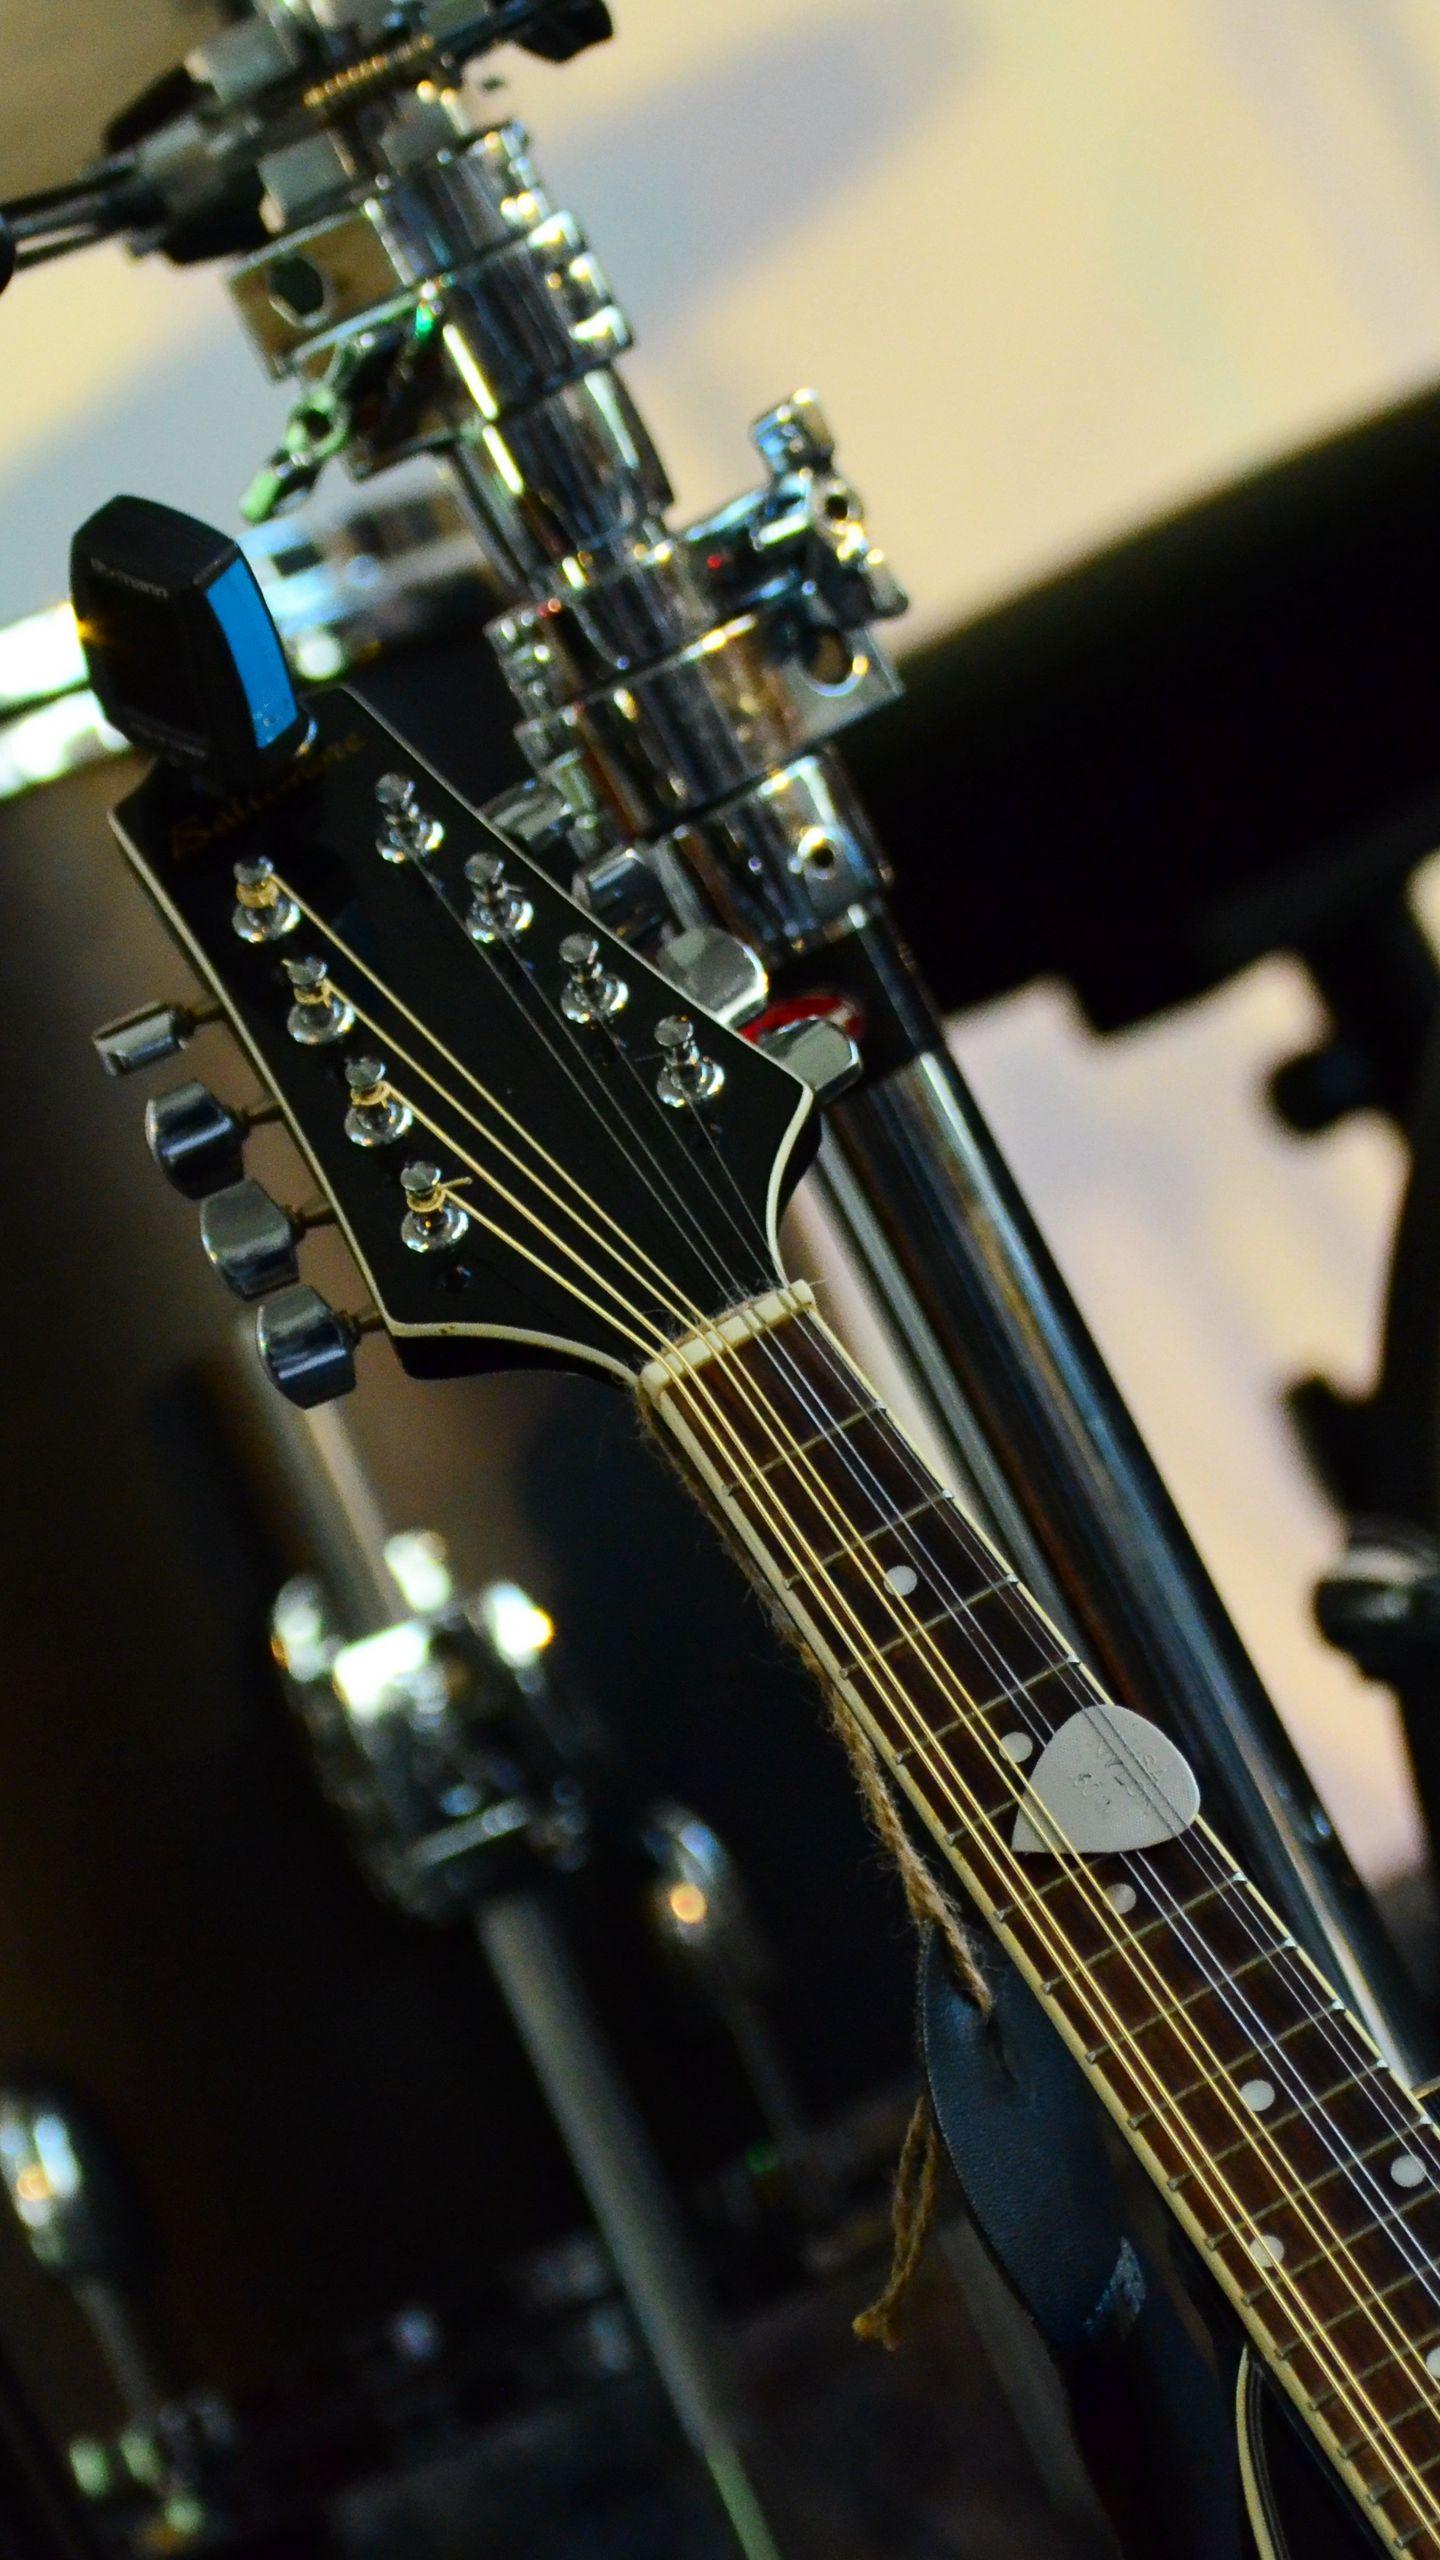 1440x2560 Wallpaper musical instrument, music, percussion, guitar